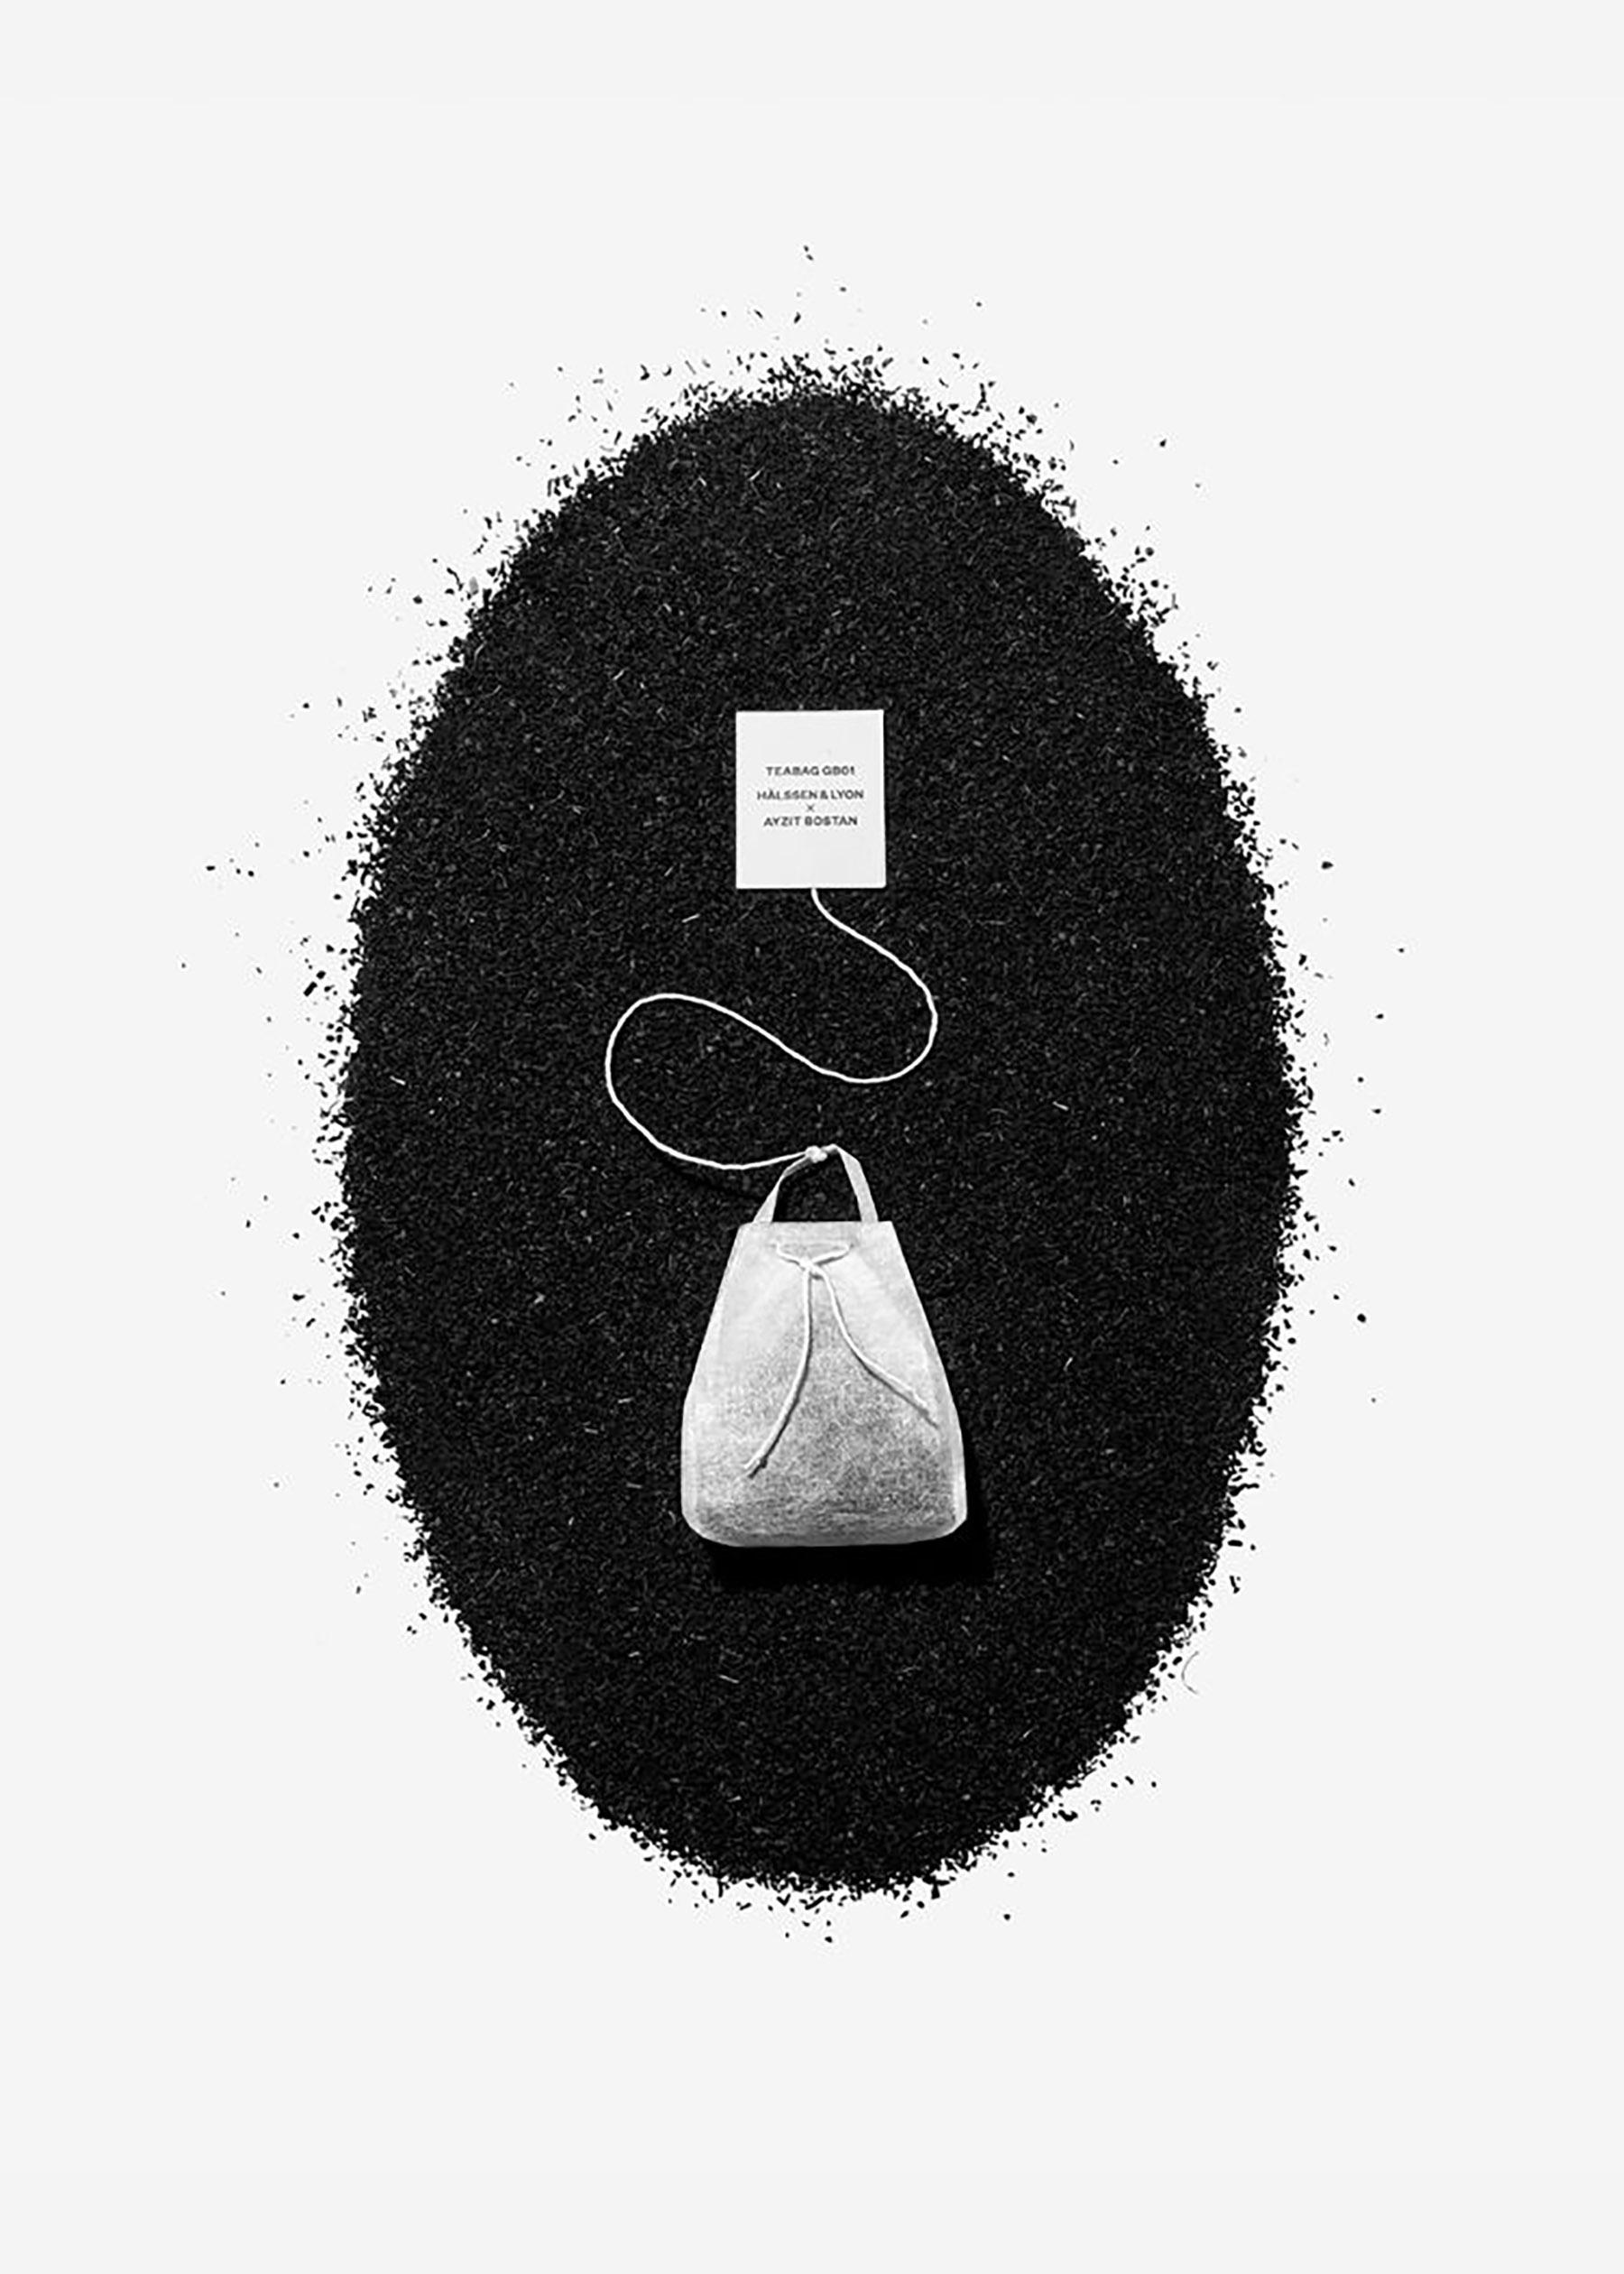 iGNANT-Design-Halssen-&-Lyon-Ayzit-Bostan-The-Teabag-Collection-01